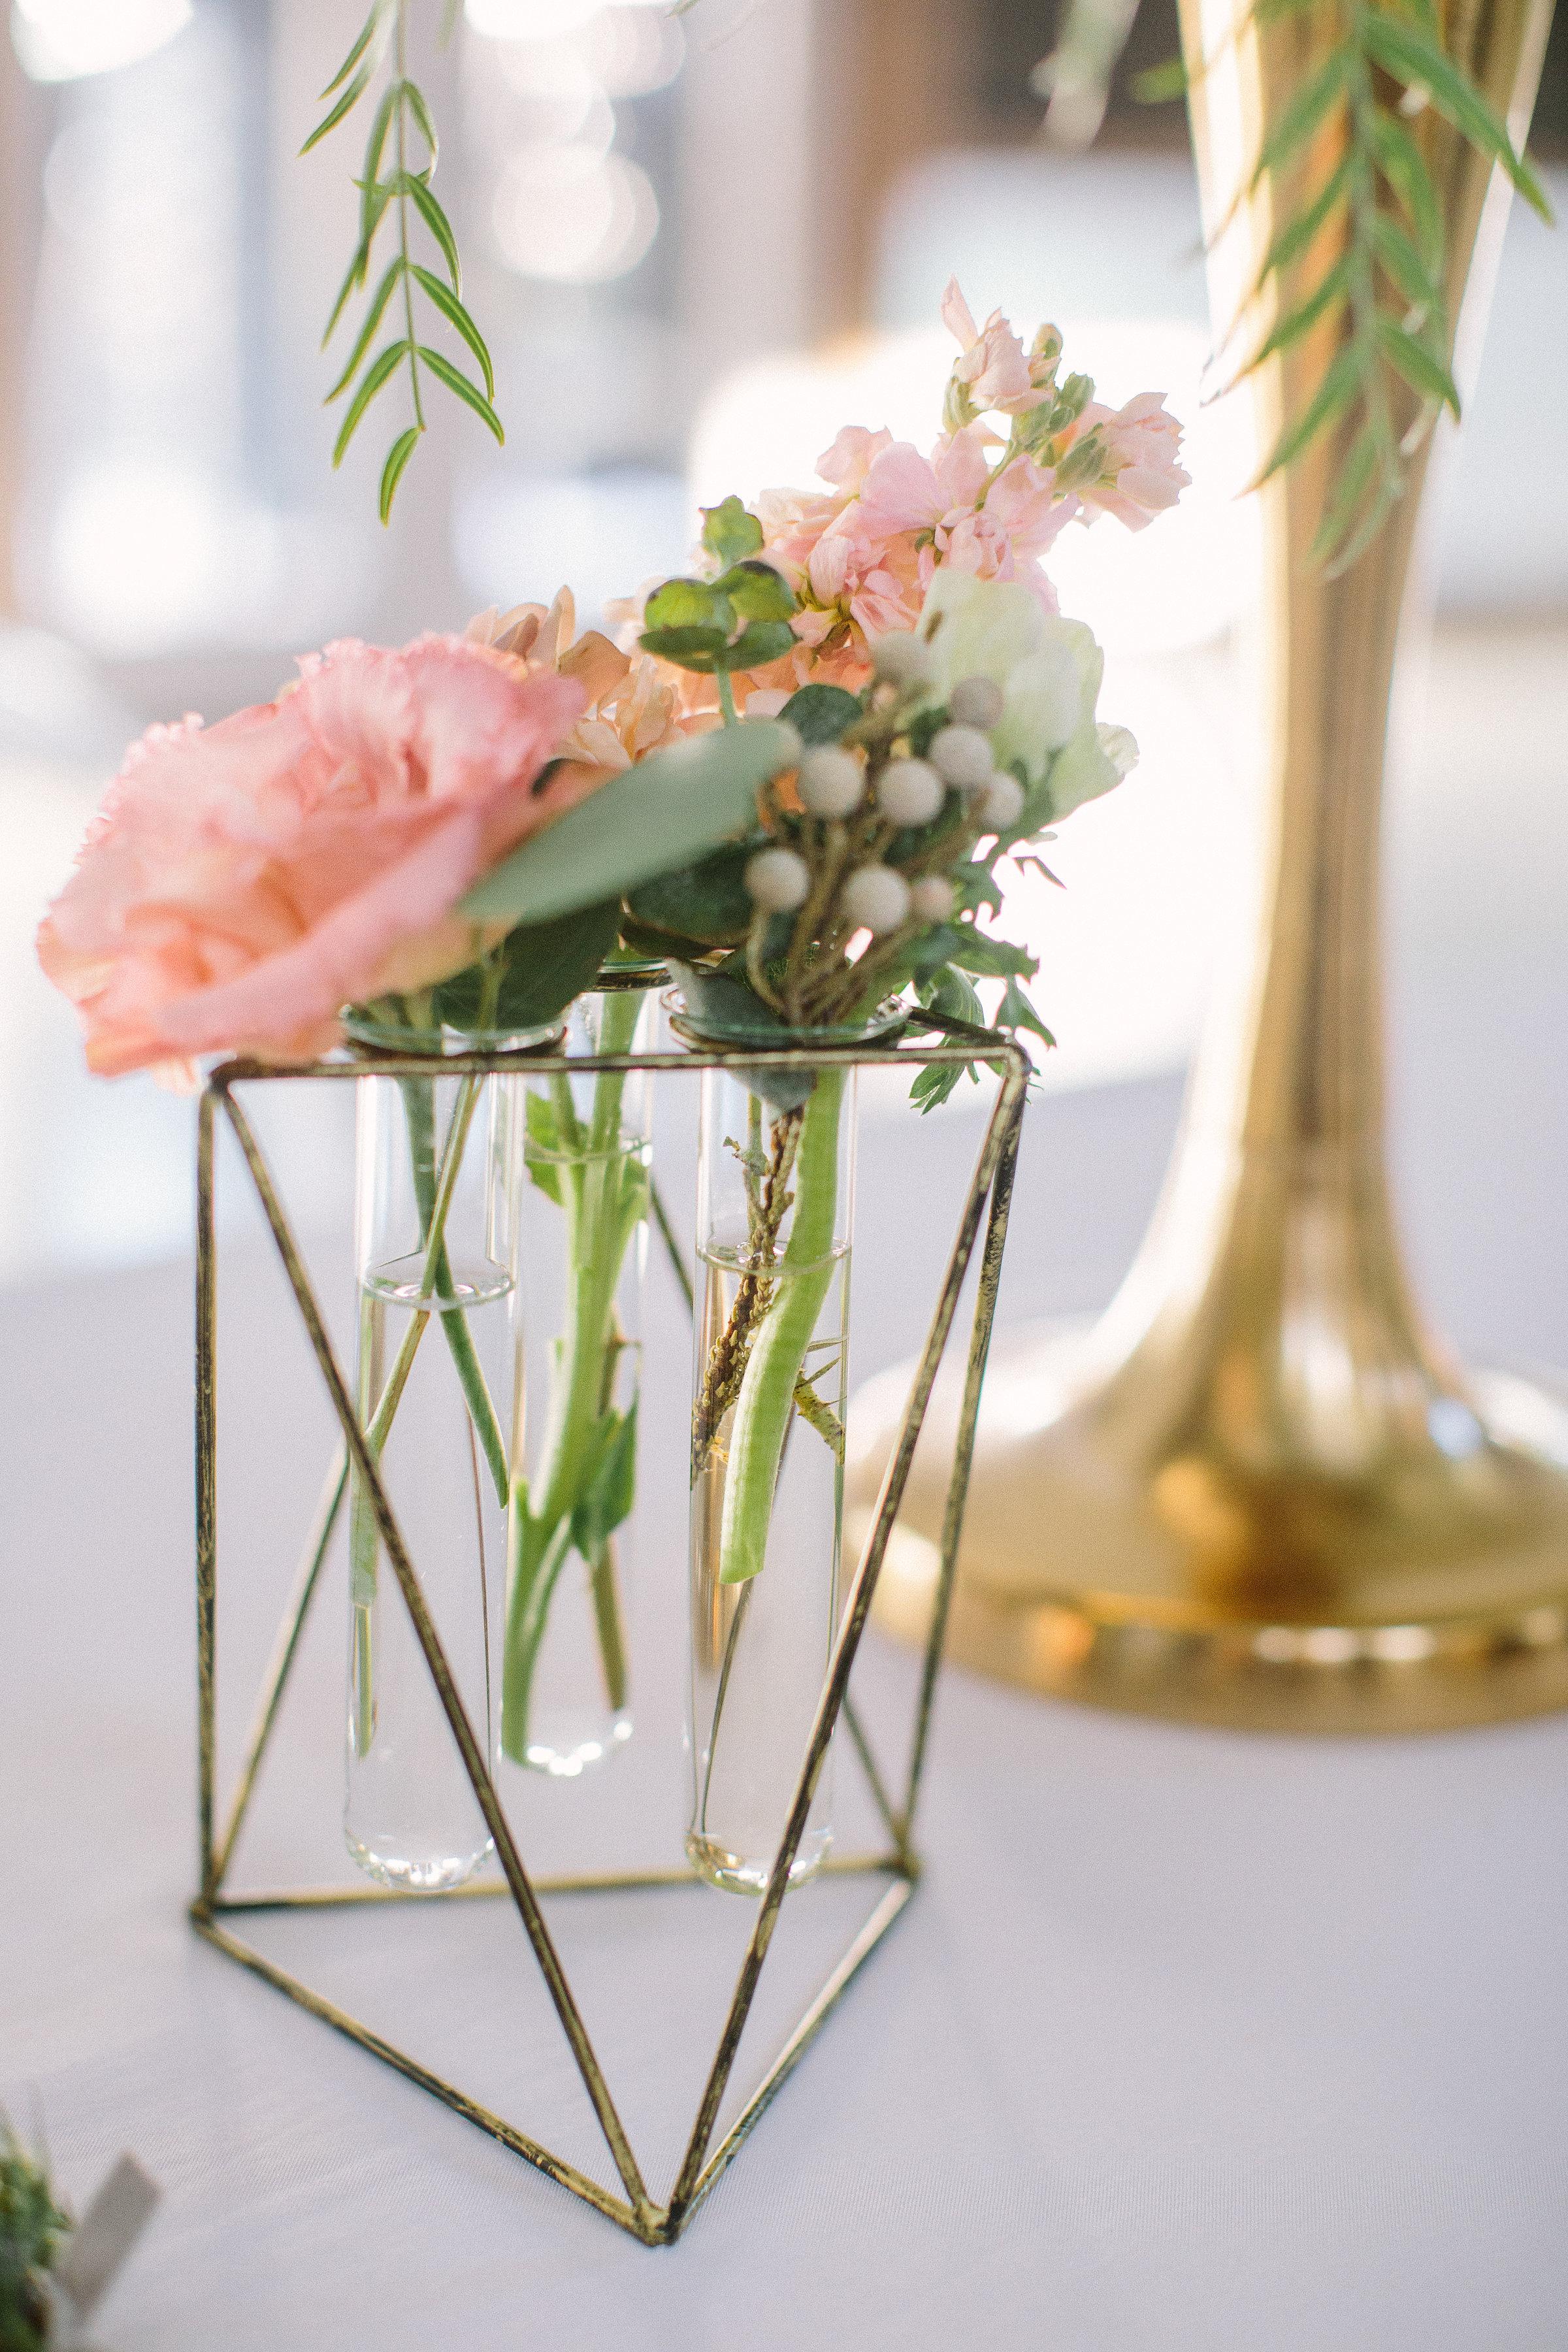 Ellen-Ashton-Photography-Peach-Creek-Ranch-Weddings-Wed-and-Prosper162